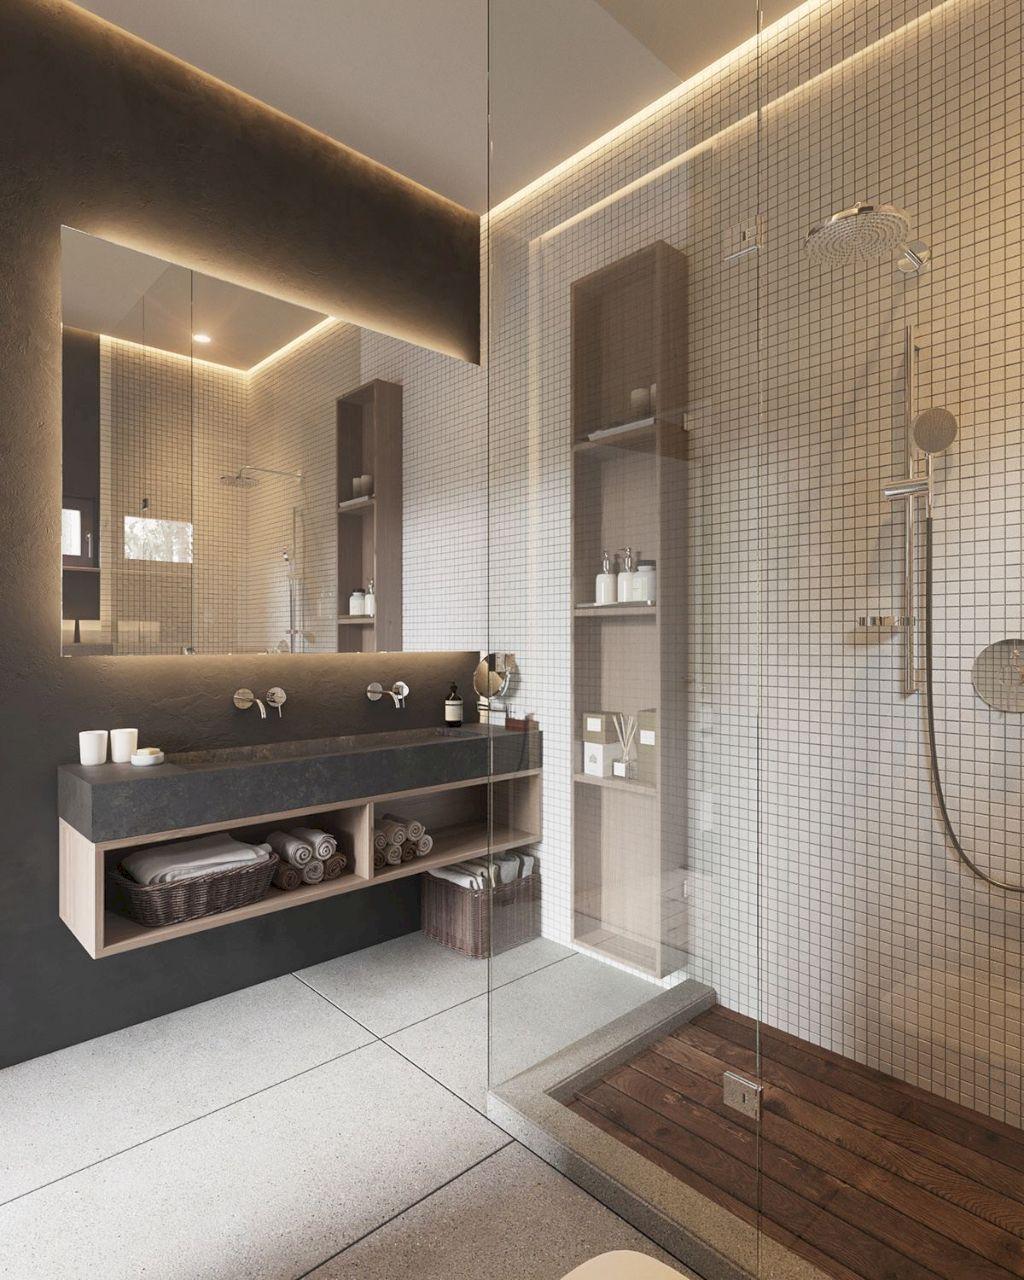 56 Ideas For Creating A Minimalist Bathroom   BellezaRoom.com